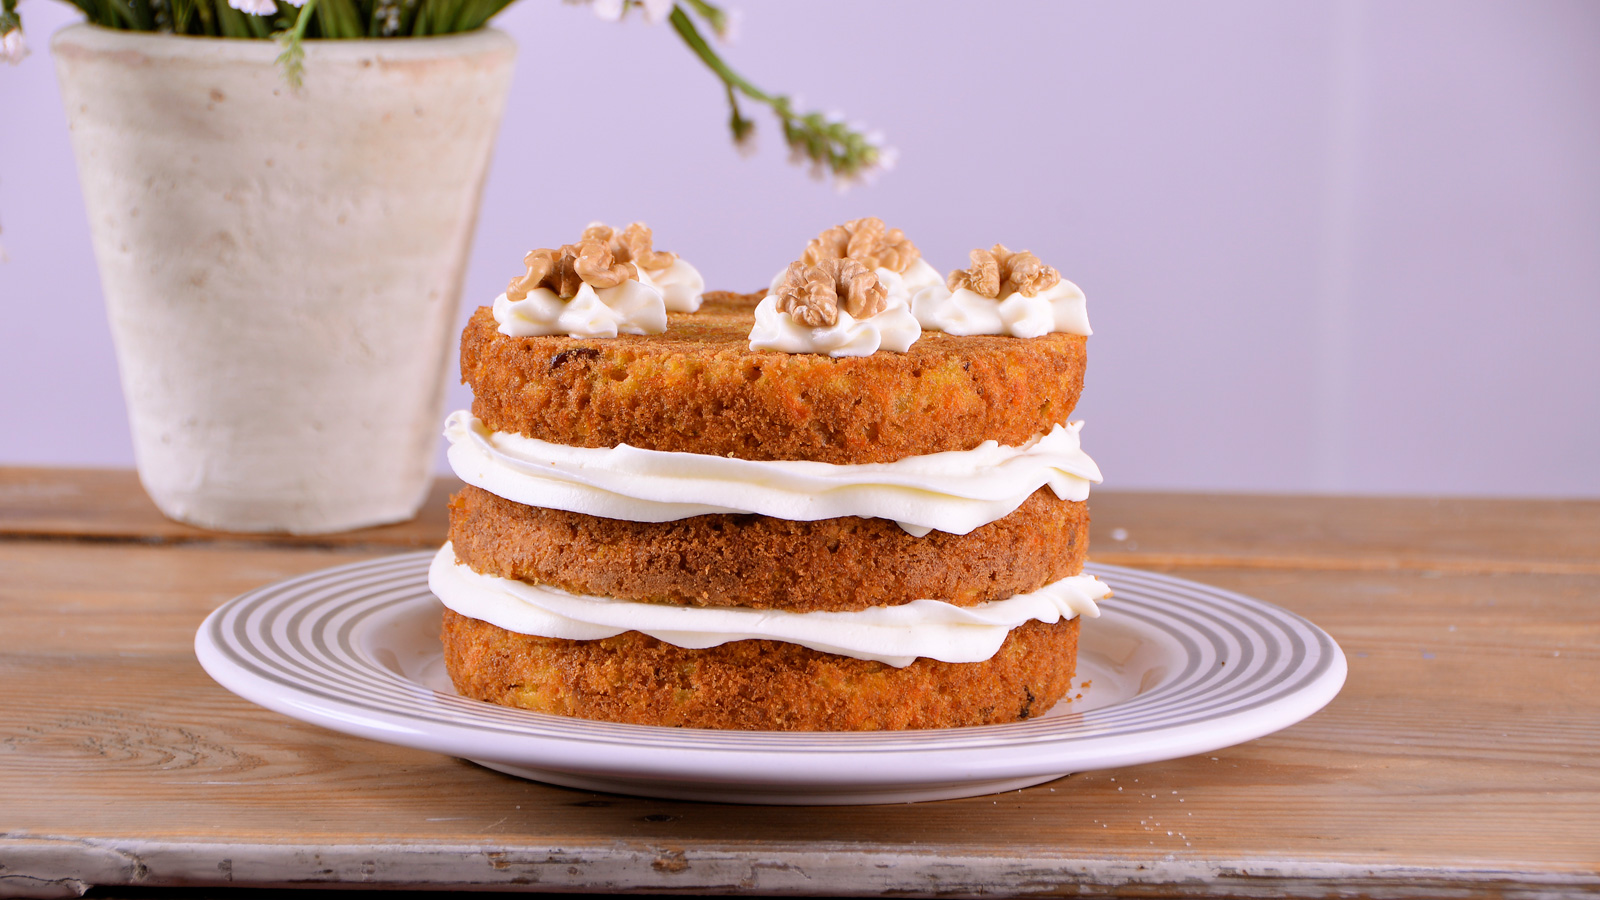 Tarta de zanahoria carrot cake alma obreg n video - Tarta red velvet alma obregon ...